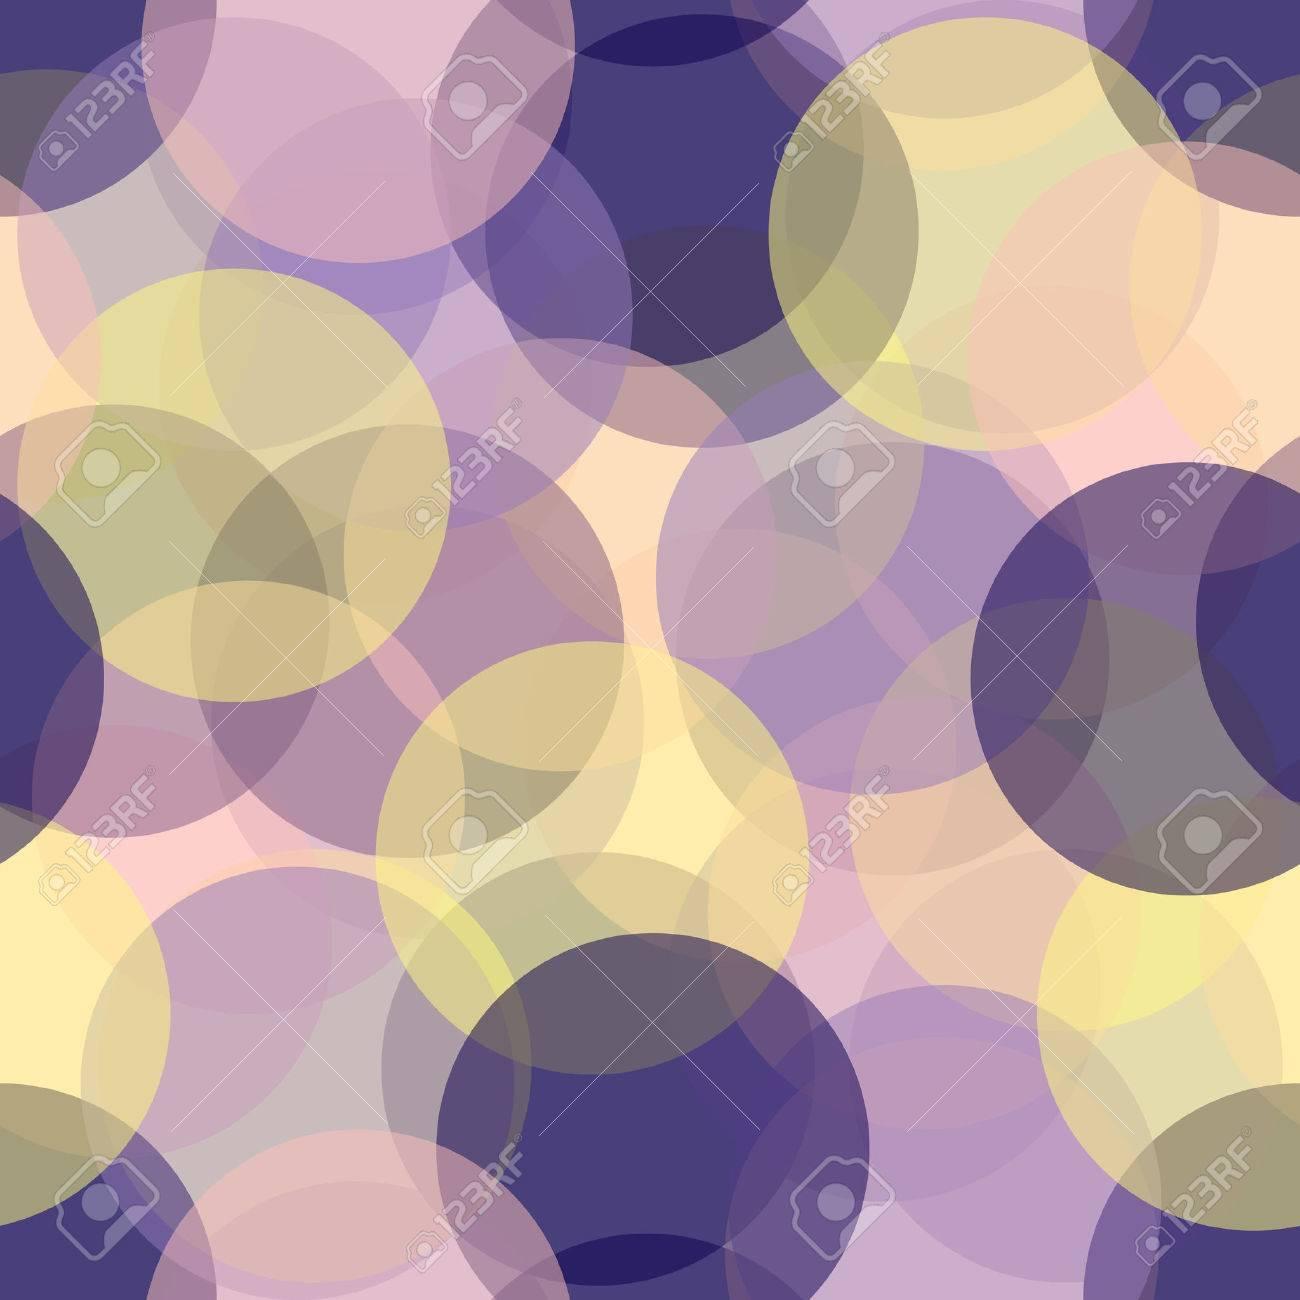 Colorful seamless circles pattern - 4948553